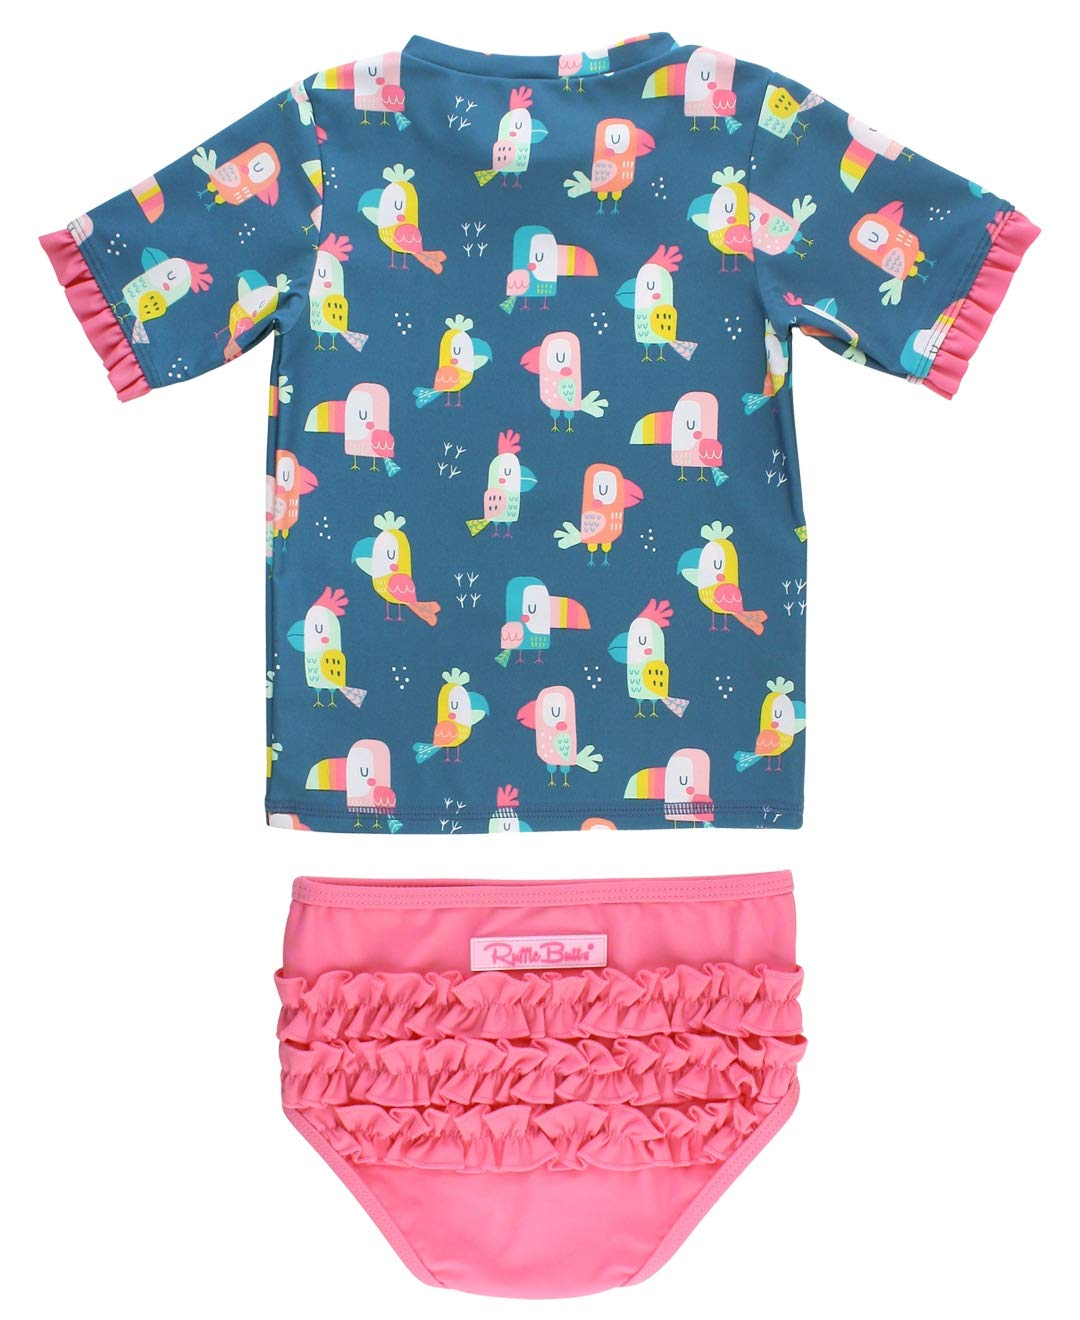 RuffleButts Girls UPF 50+ 2-Piece Short Sleeve Rash Guard Bikini w/Ruffles